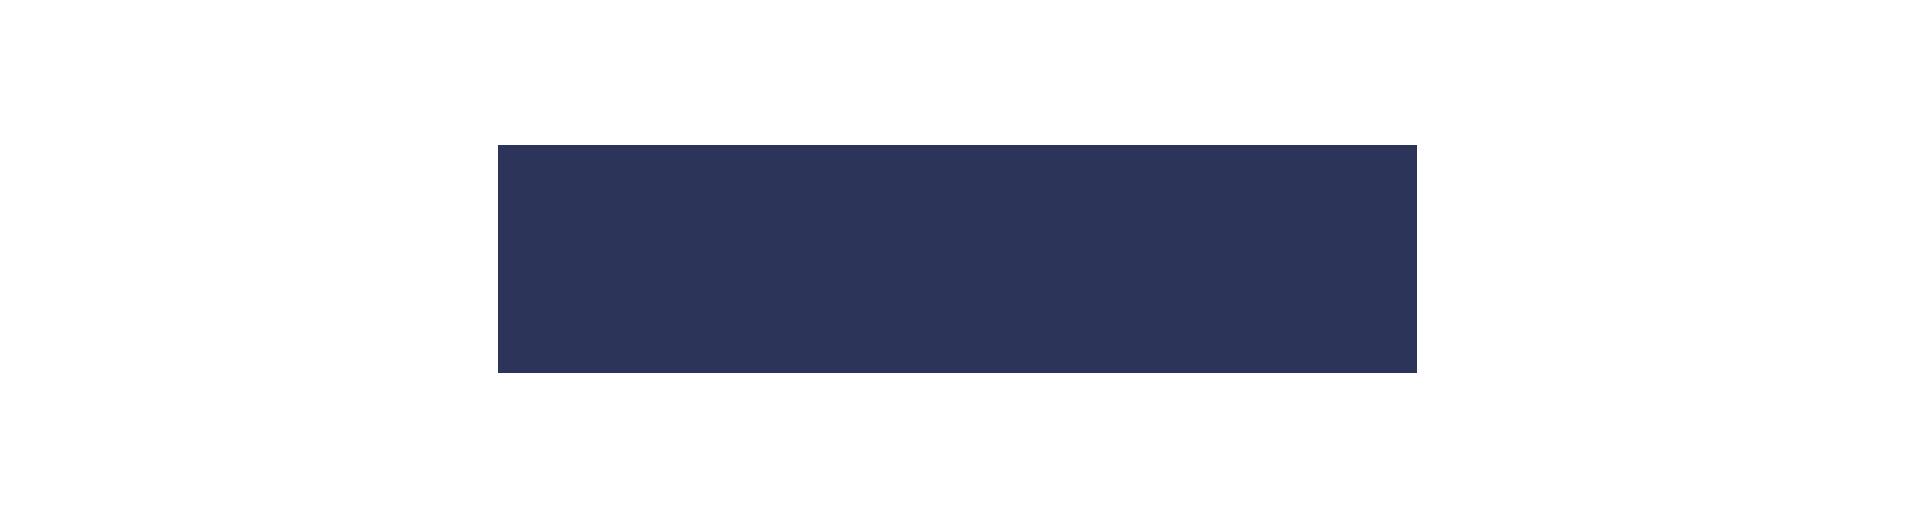 aliance_7